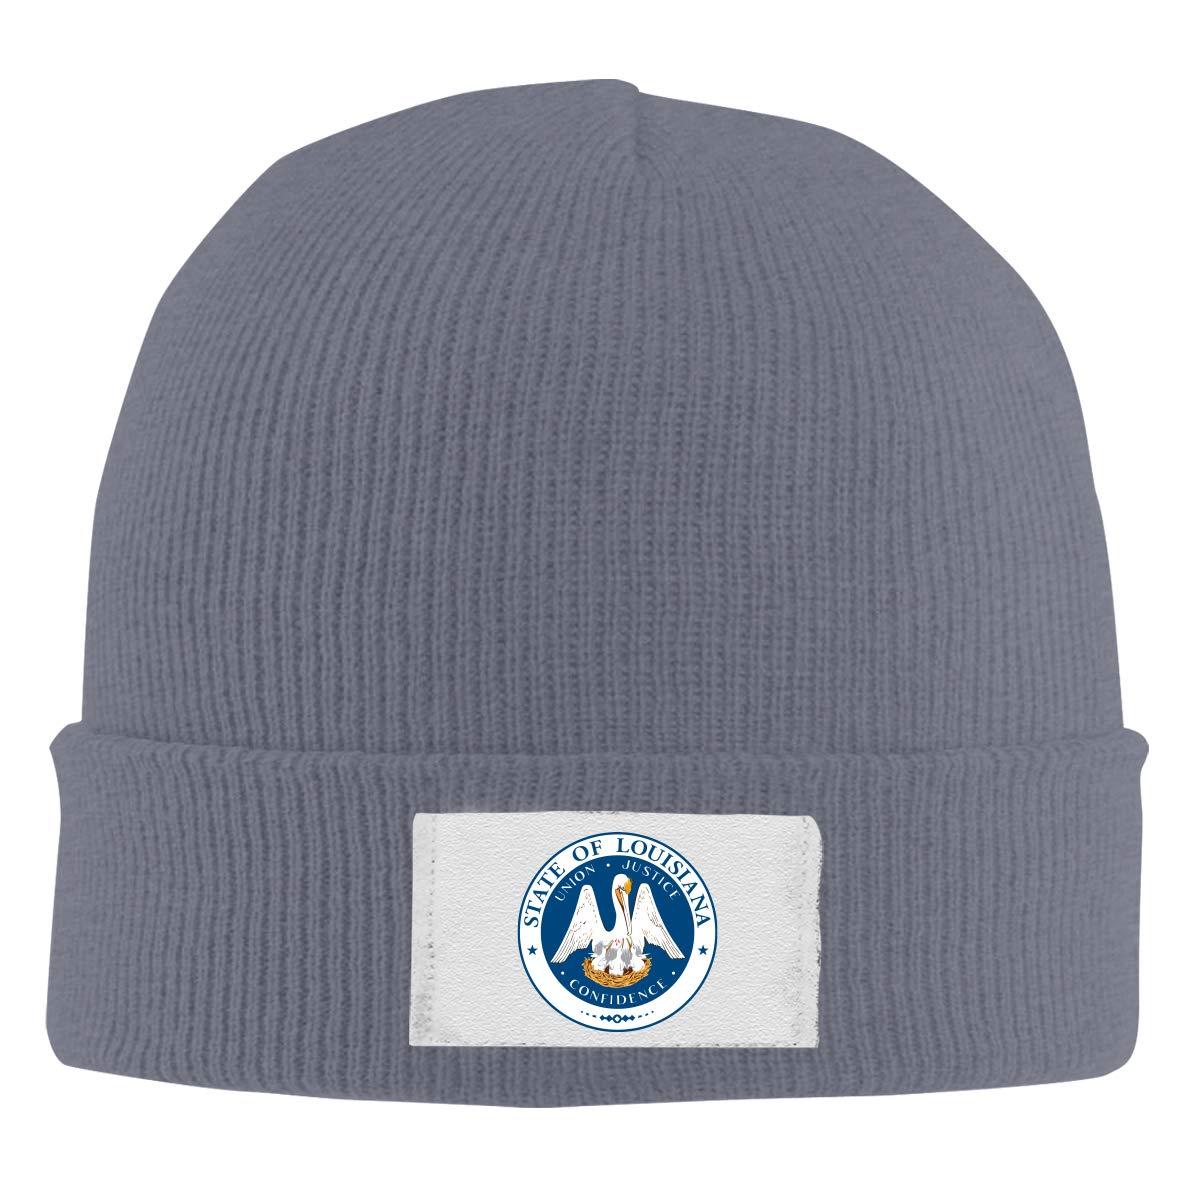 Stretchy Cuff Beanie Hat Black Dunpaiaa Skull Caps Louisiana State Flag Logo Winter Warm Knit Hats